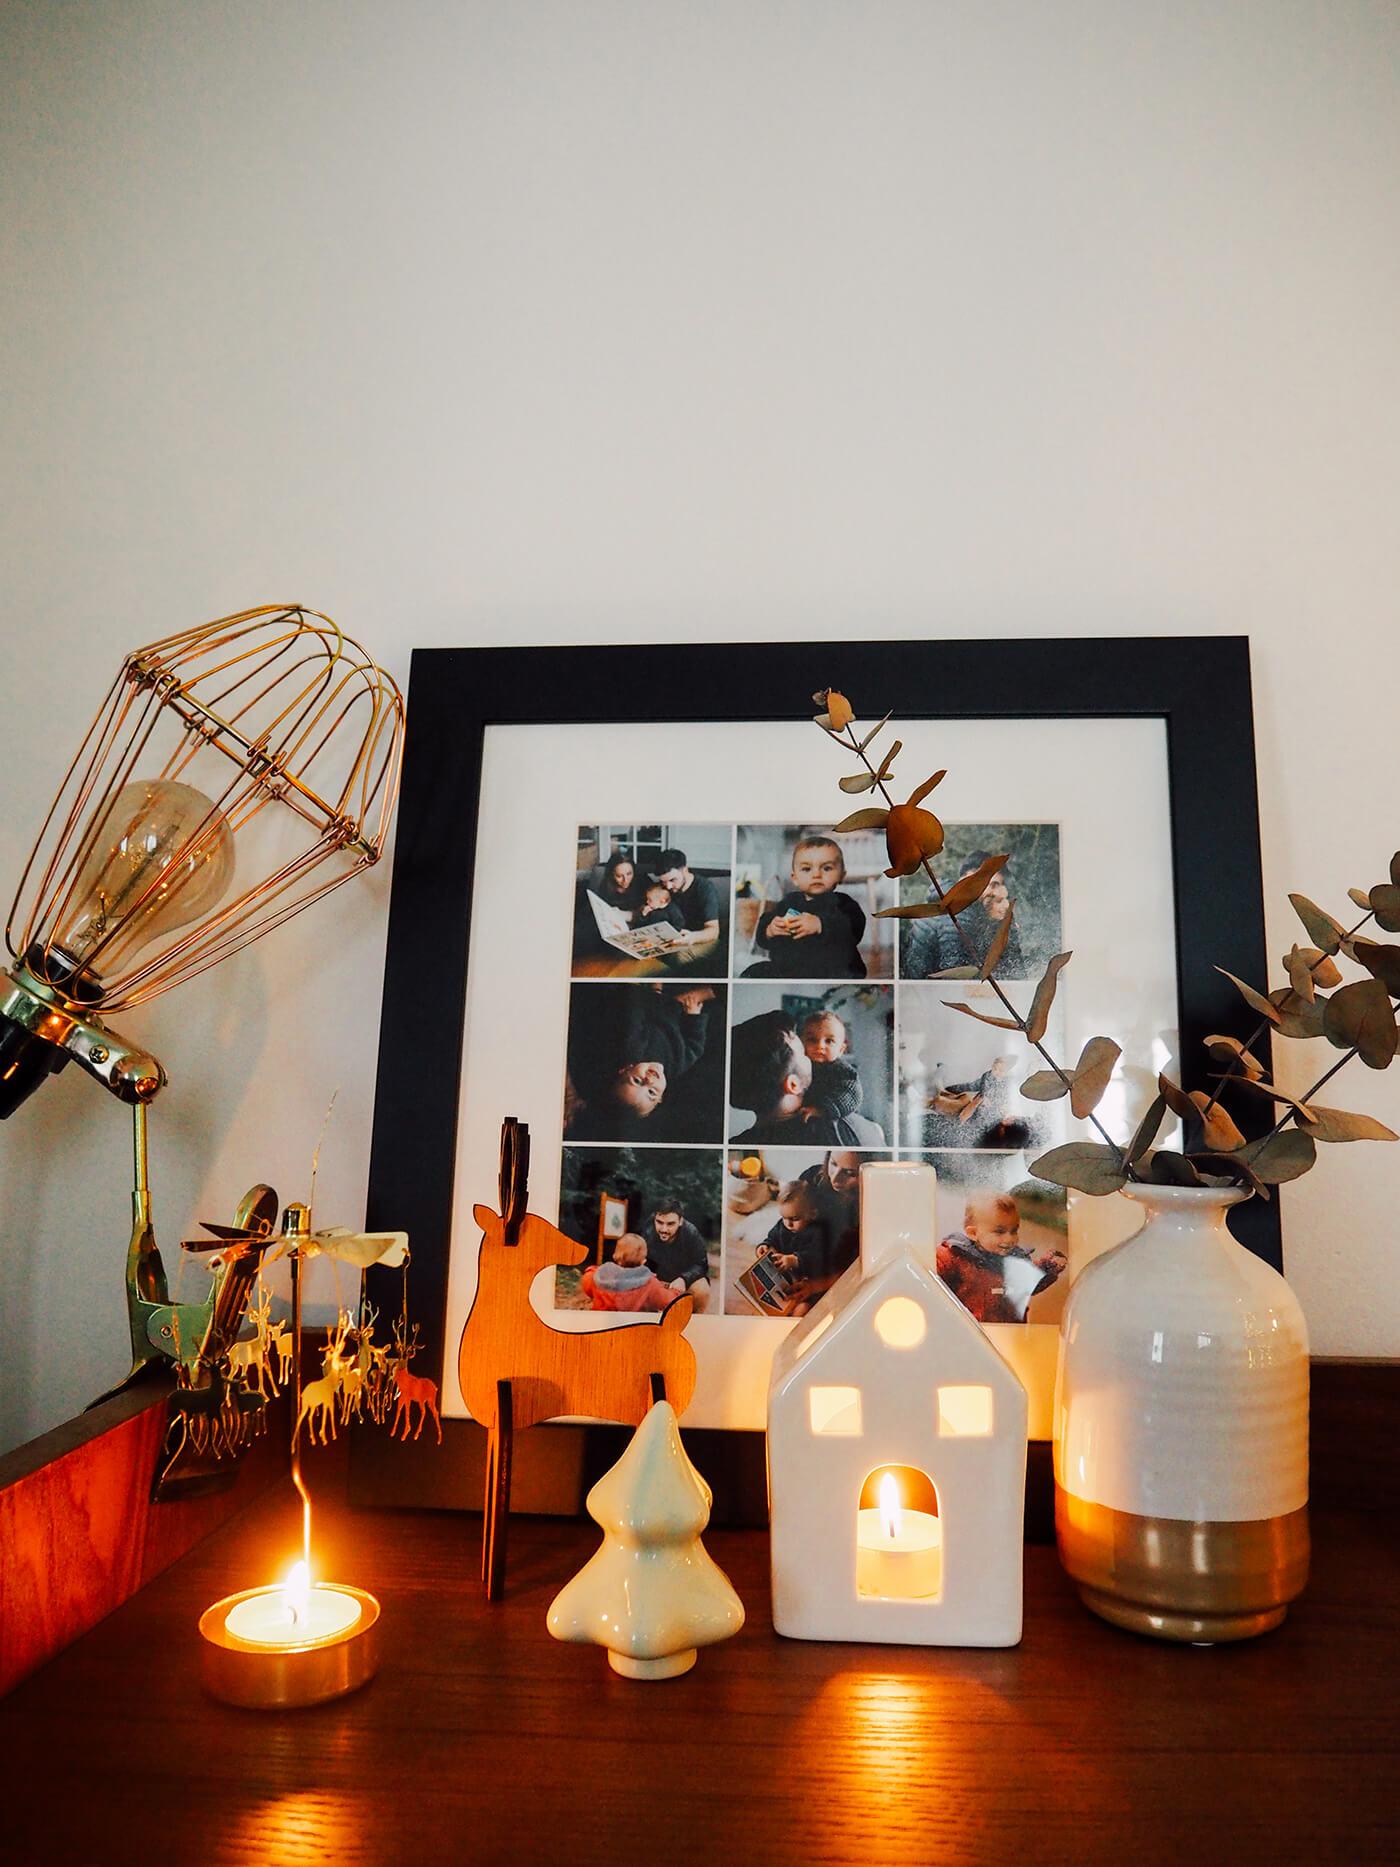 decorer appartement noel sapin artificiel balsam hill frenchyfancy 8 frenchy fancy. Black Bedroom Furniture Sets. Home Design Ideas